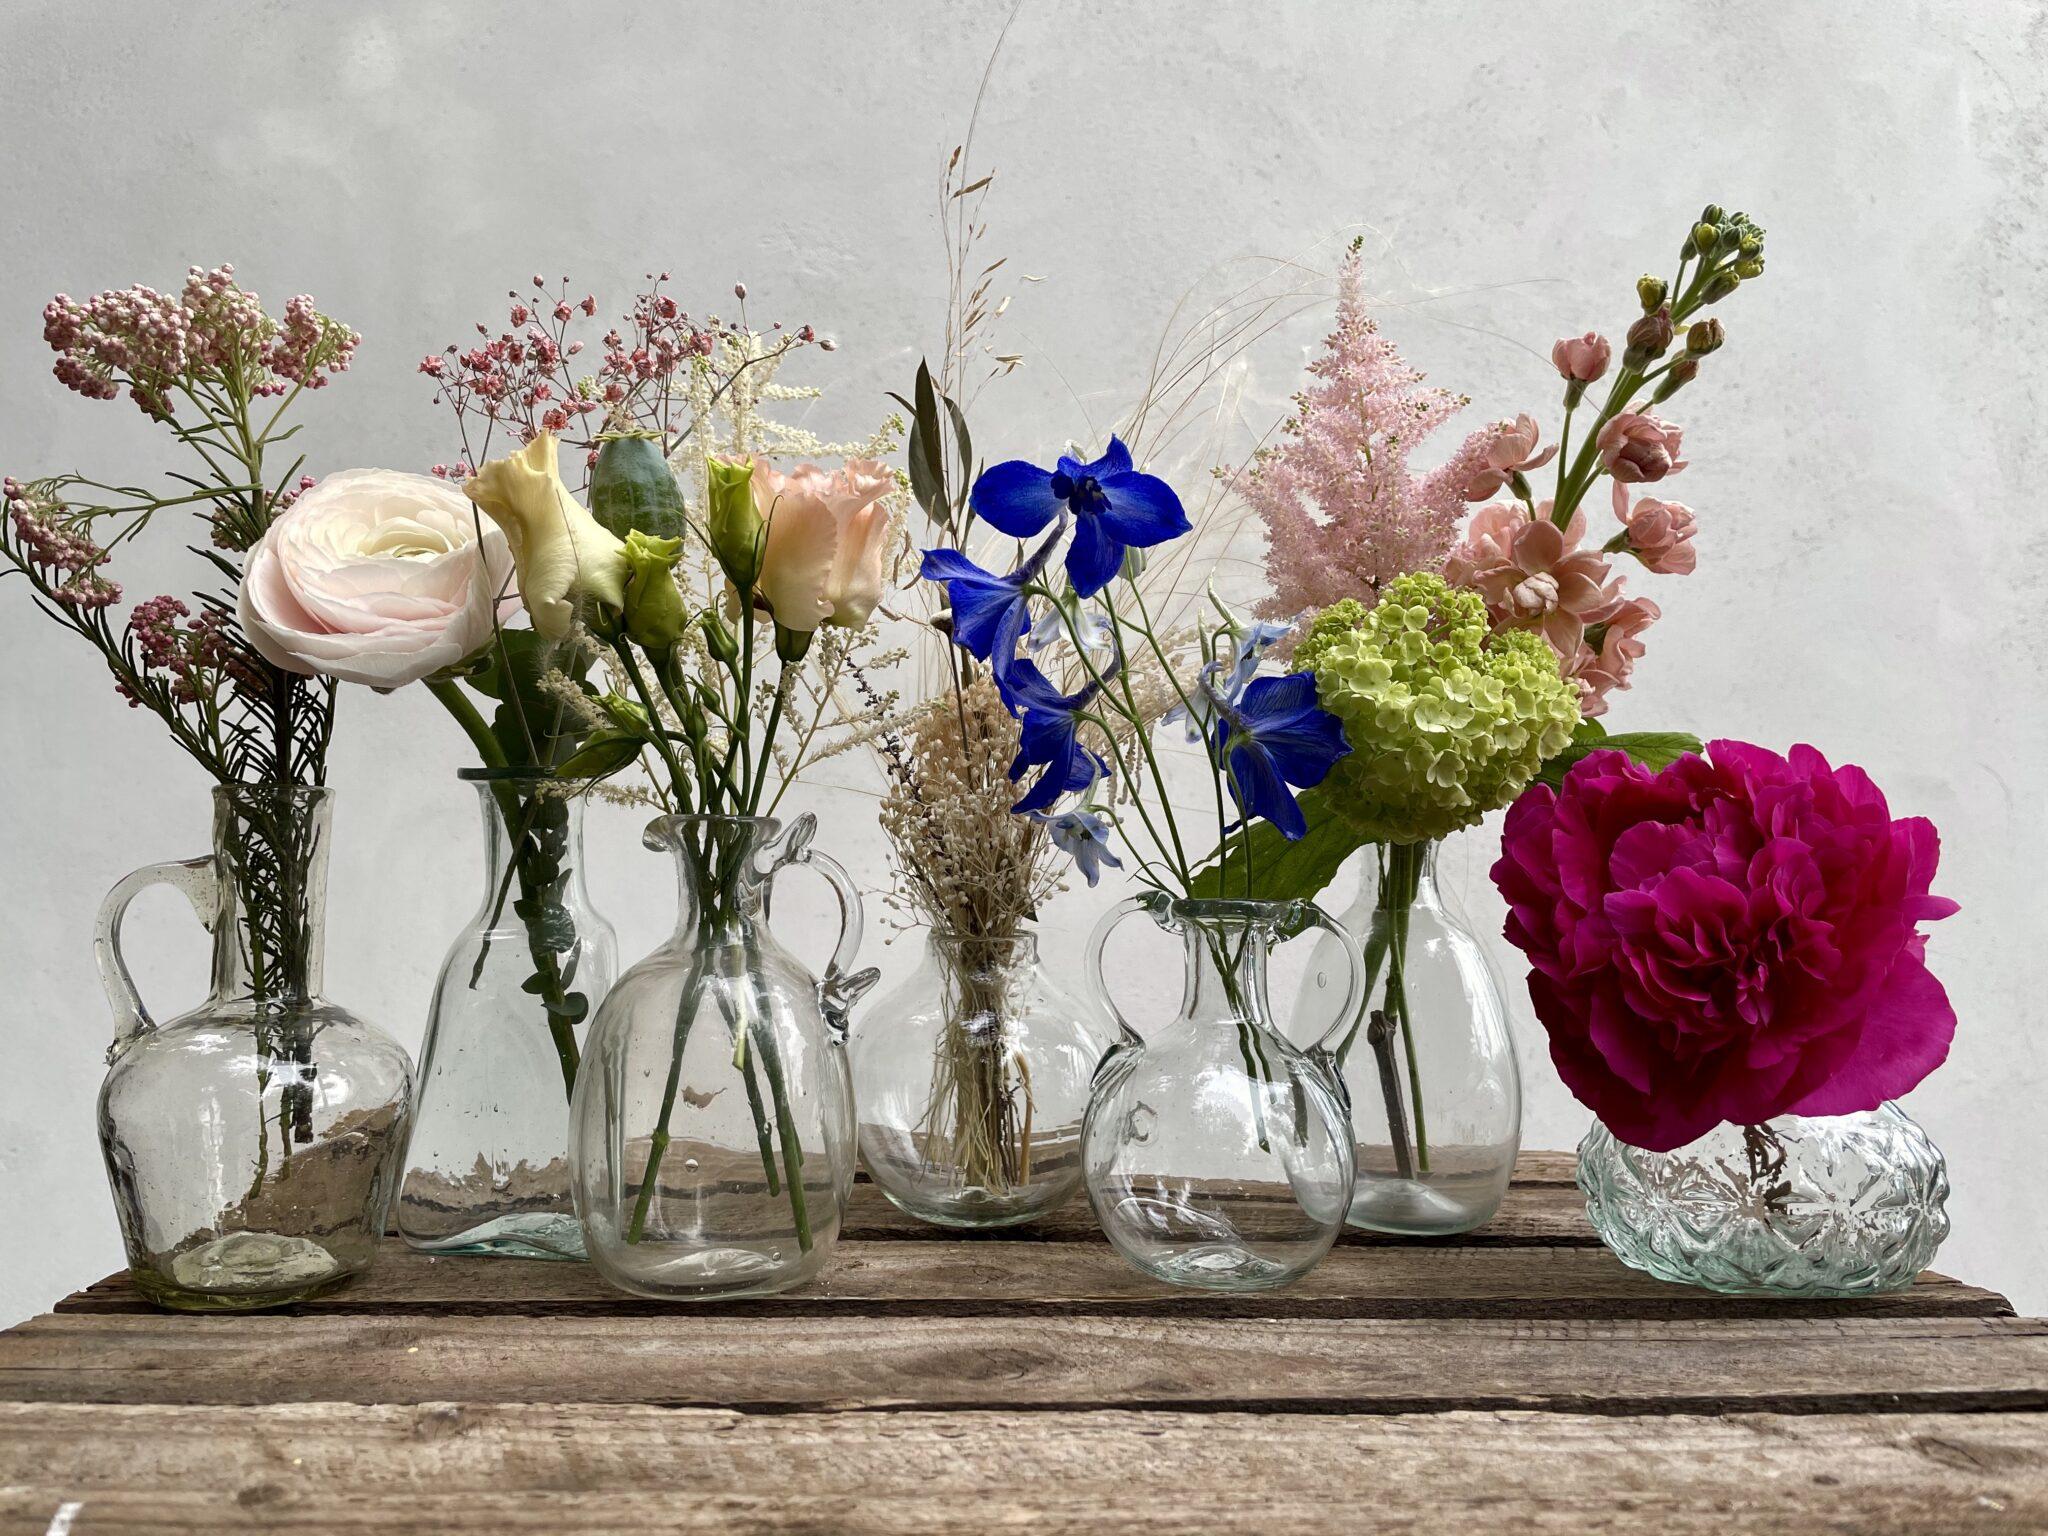 la-soufflerie-wedding-placeholder-bud-vases-with-flowers